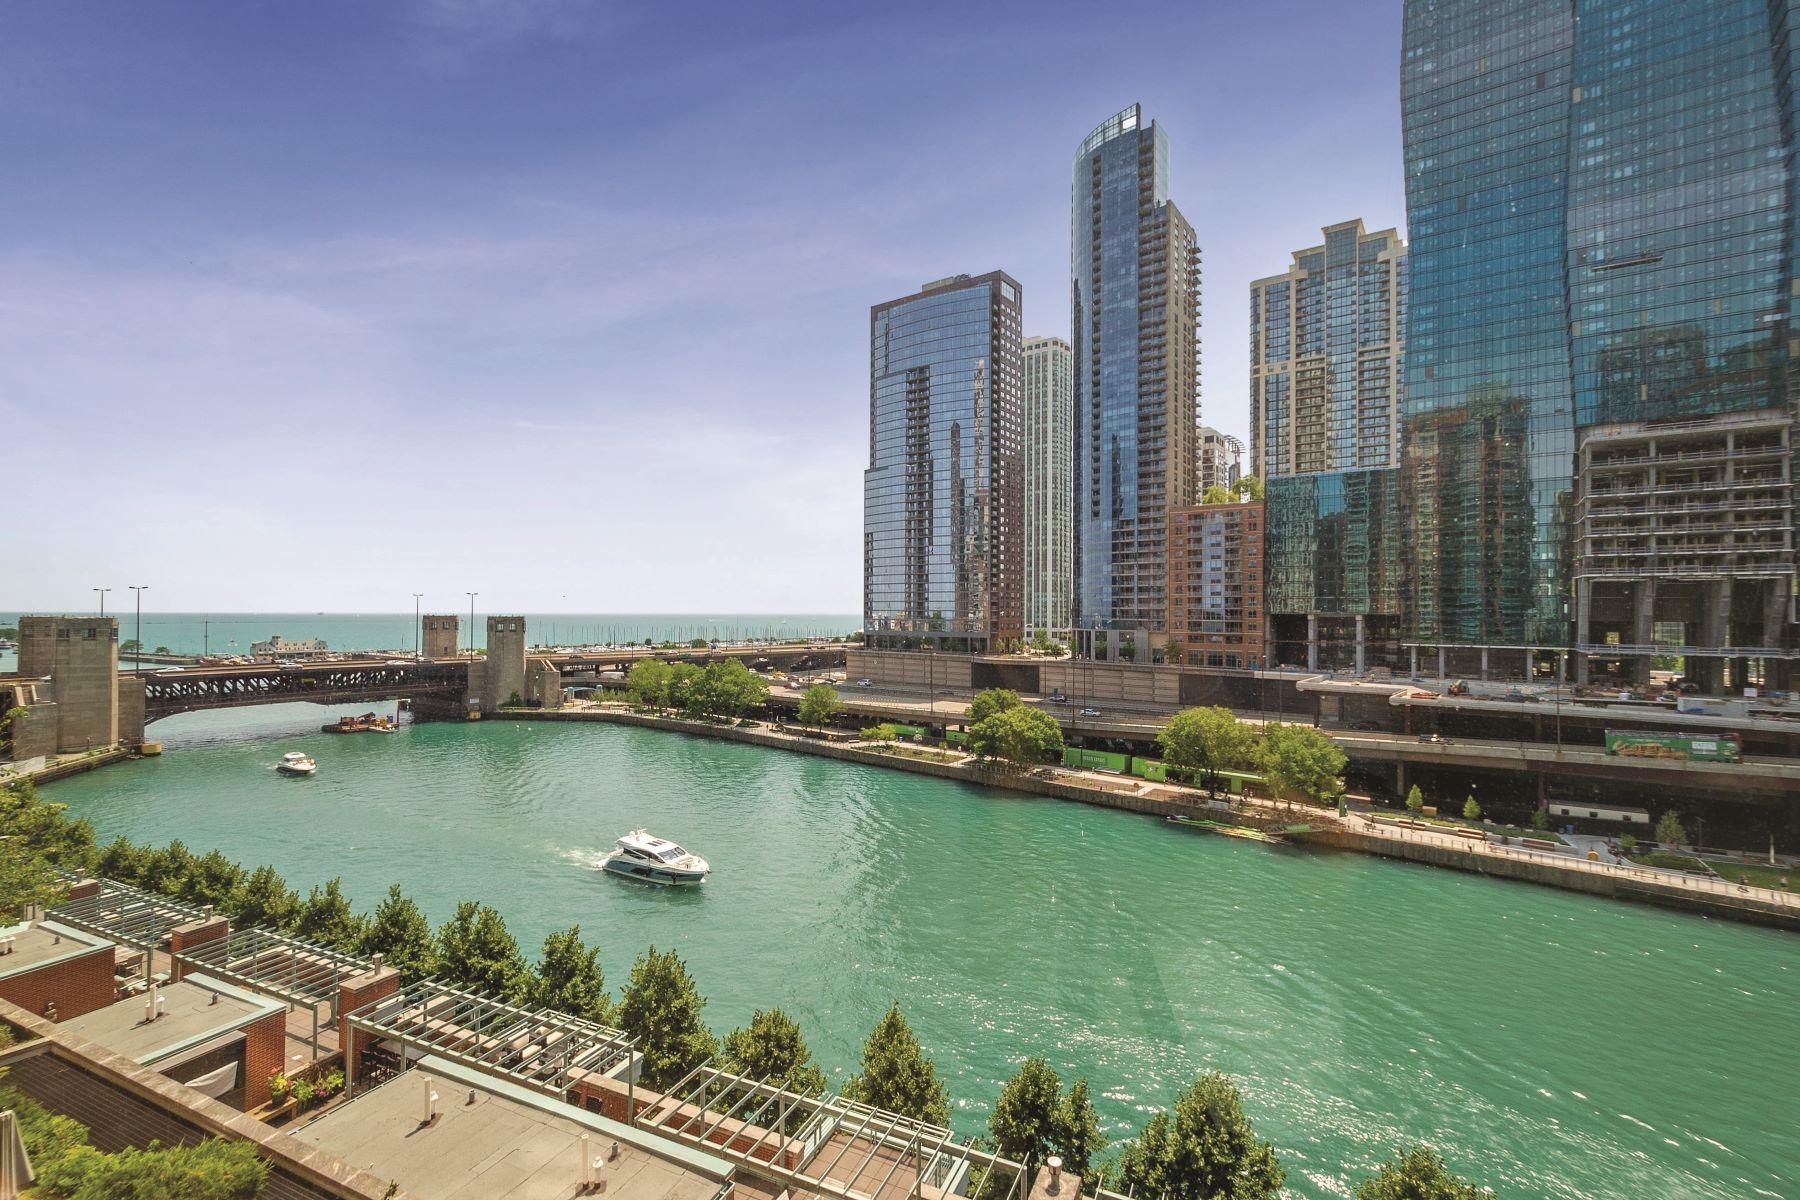 Condominiums 为 销售 在 Premier River Residences 415 E North Water Street Unit W-905 芝加哥, 伊利诺斯州 60611 美国